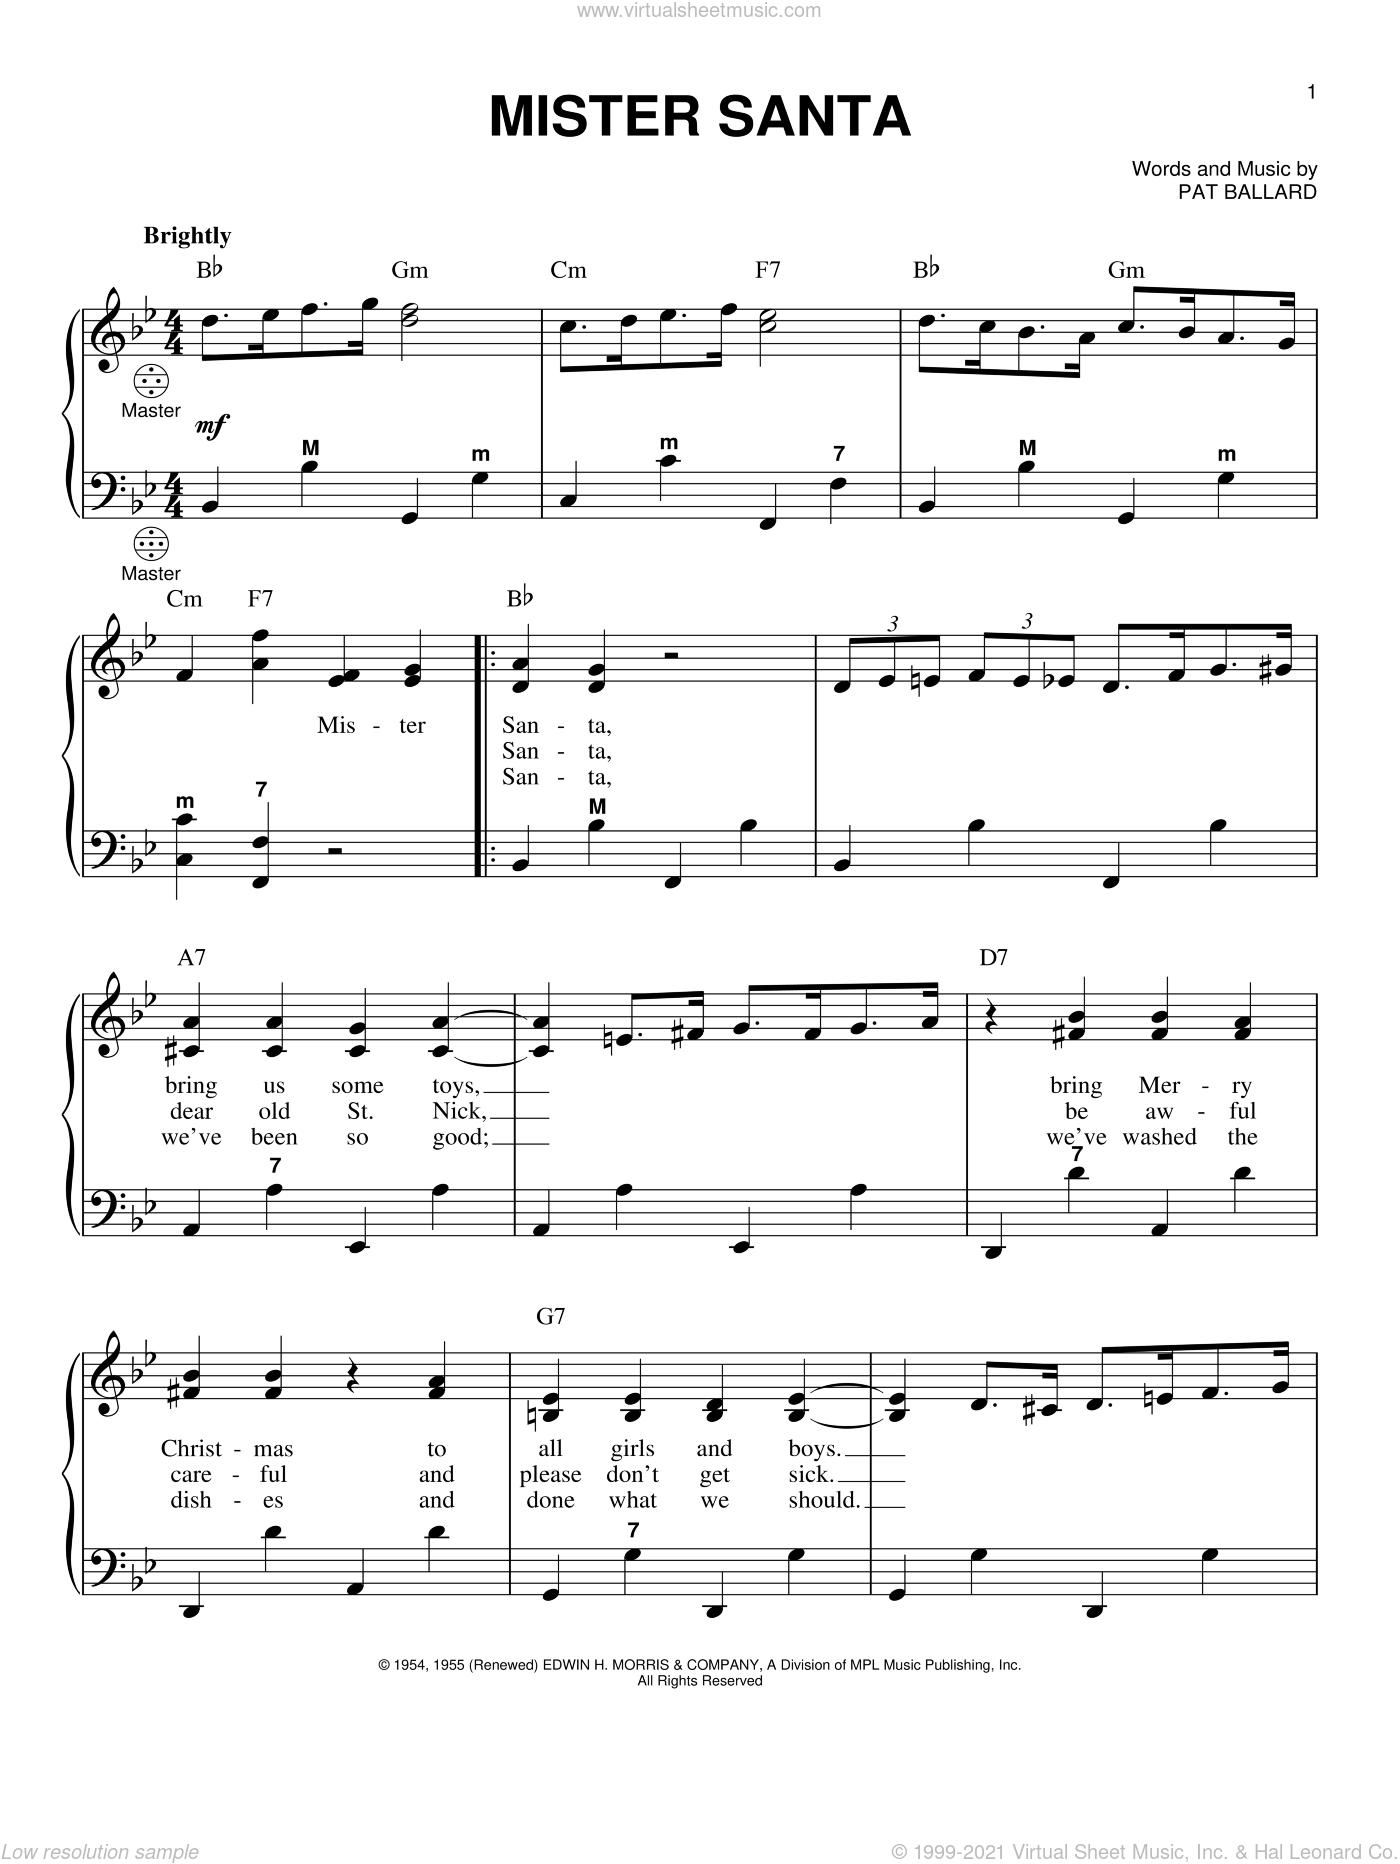 Mister Santa sheet music for accordion by Pat Ballard and Gary Meisner, intermediate skill level